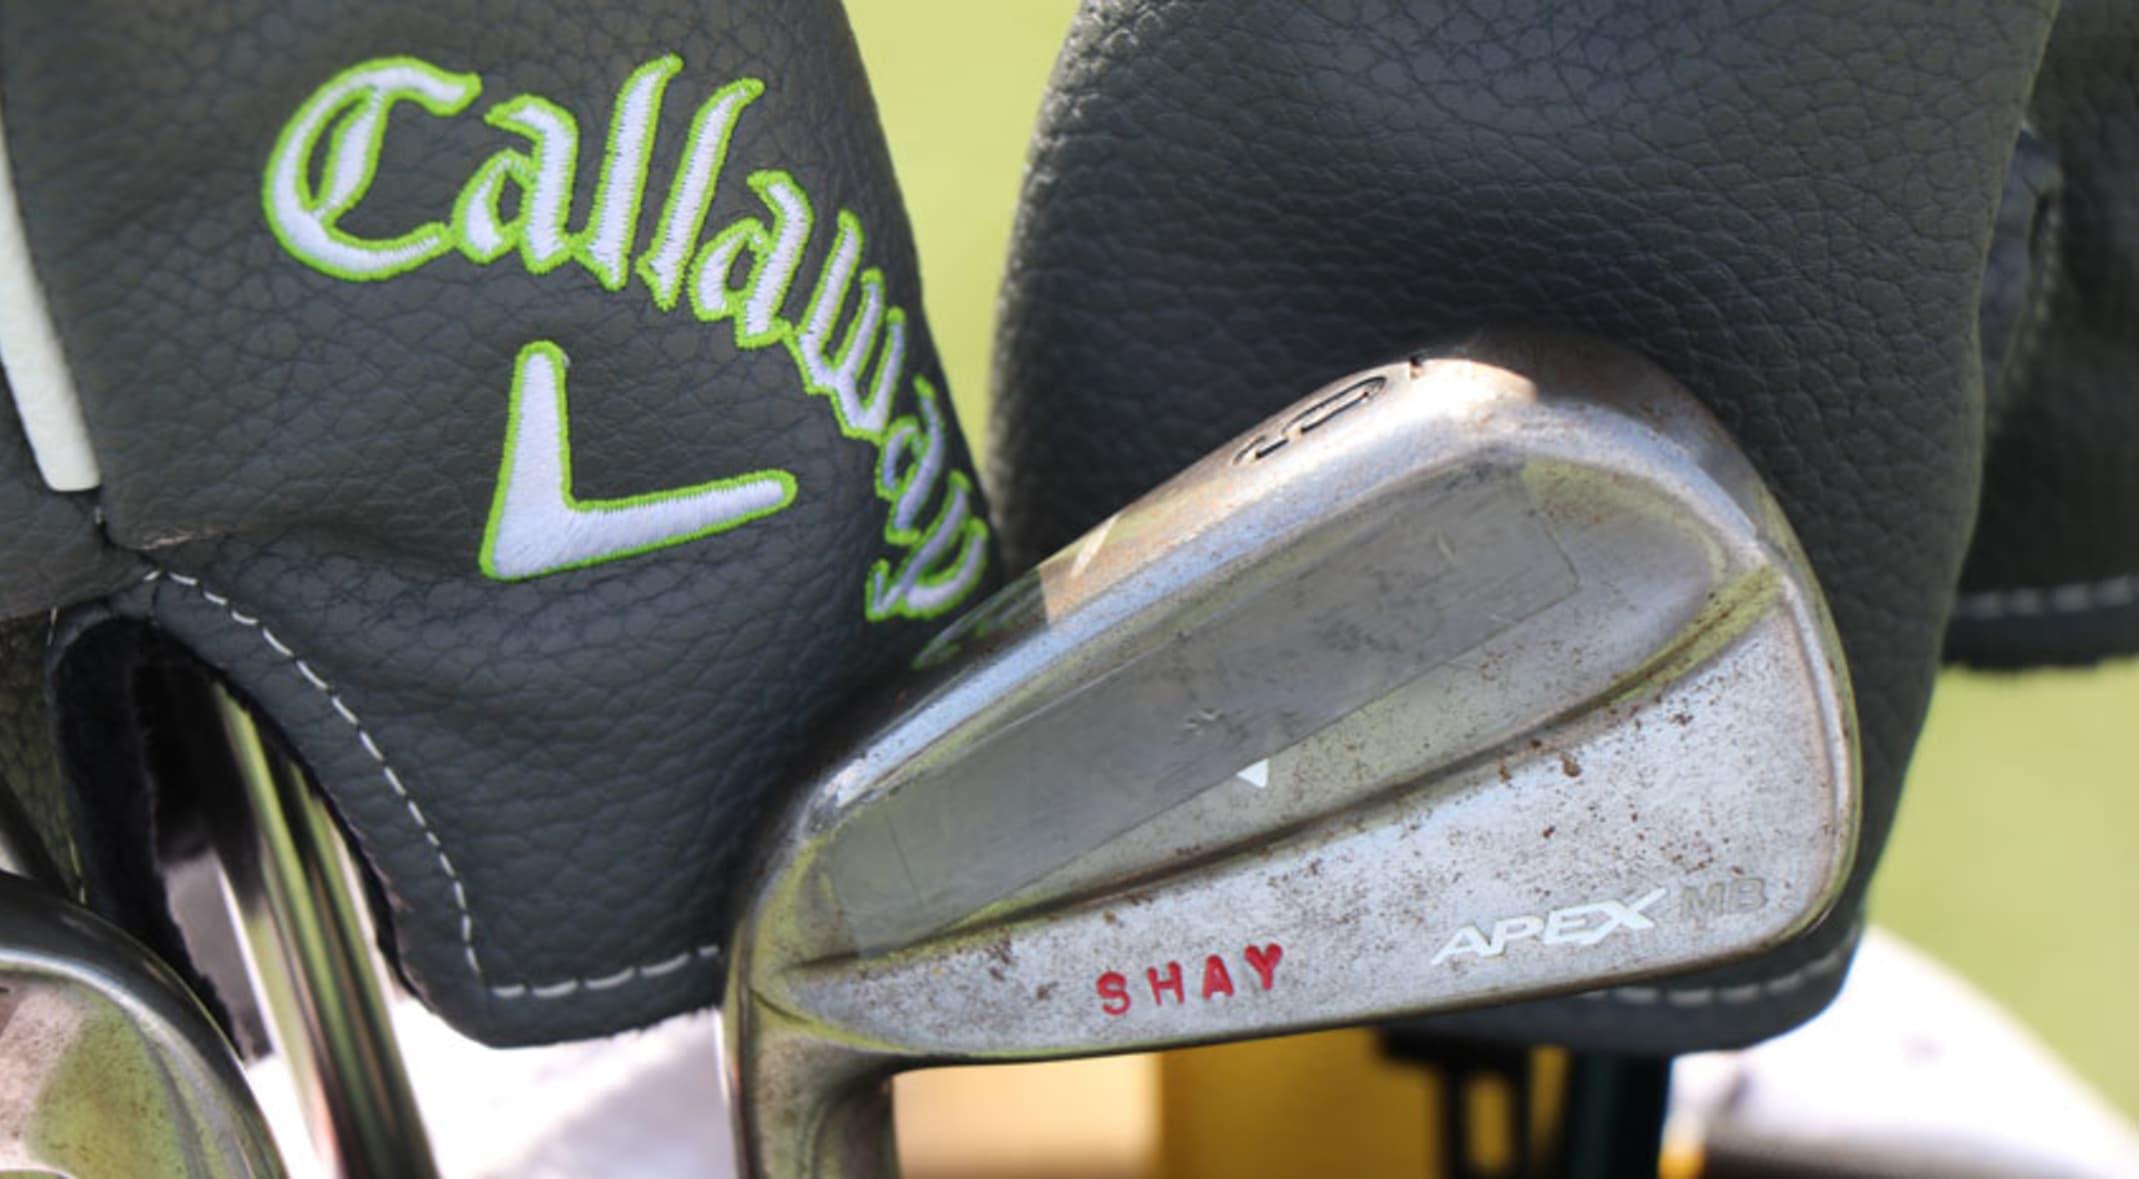 Amateur golf clubs